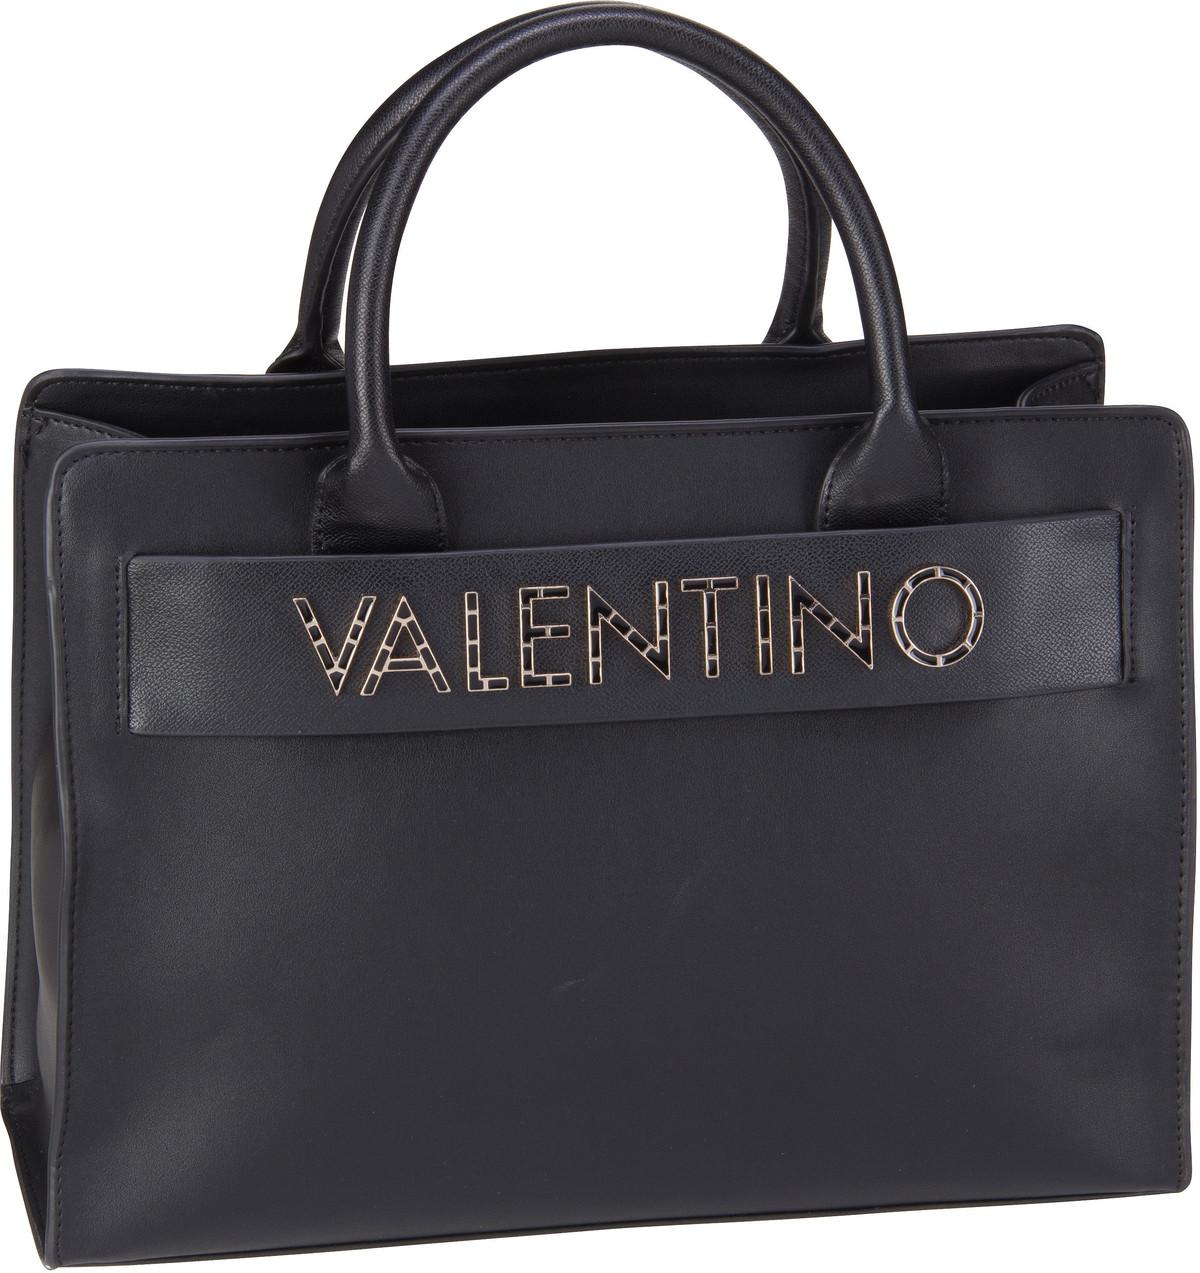 Bags Handtasche Fisarmonica Shopping X05 Nero